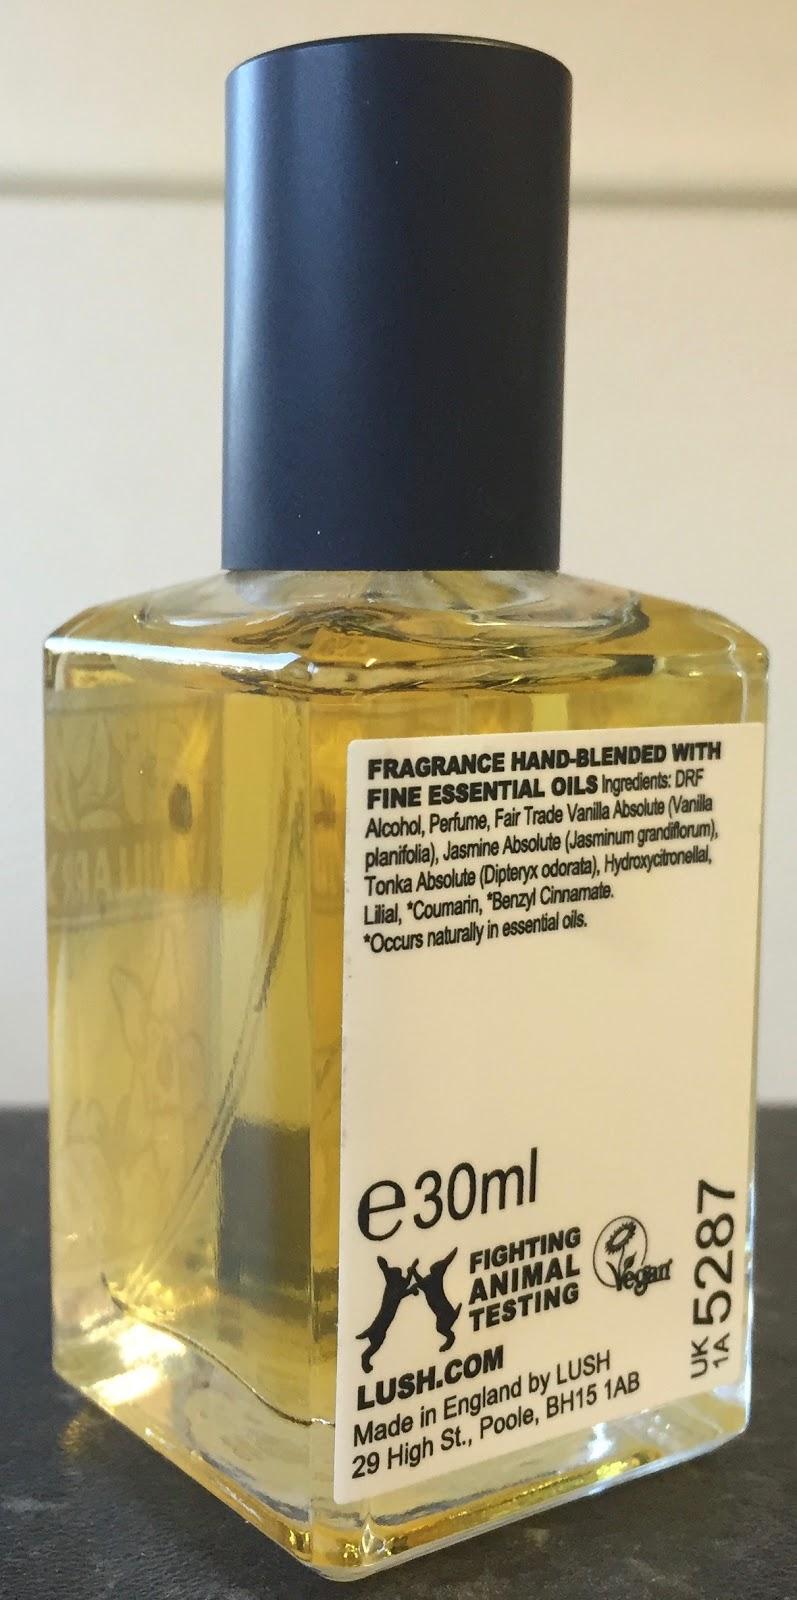 Dior   Hypnotic Poison   Perfumes Wexford   Fehilys